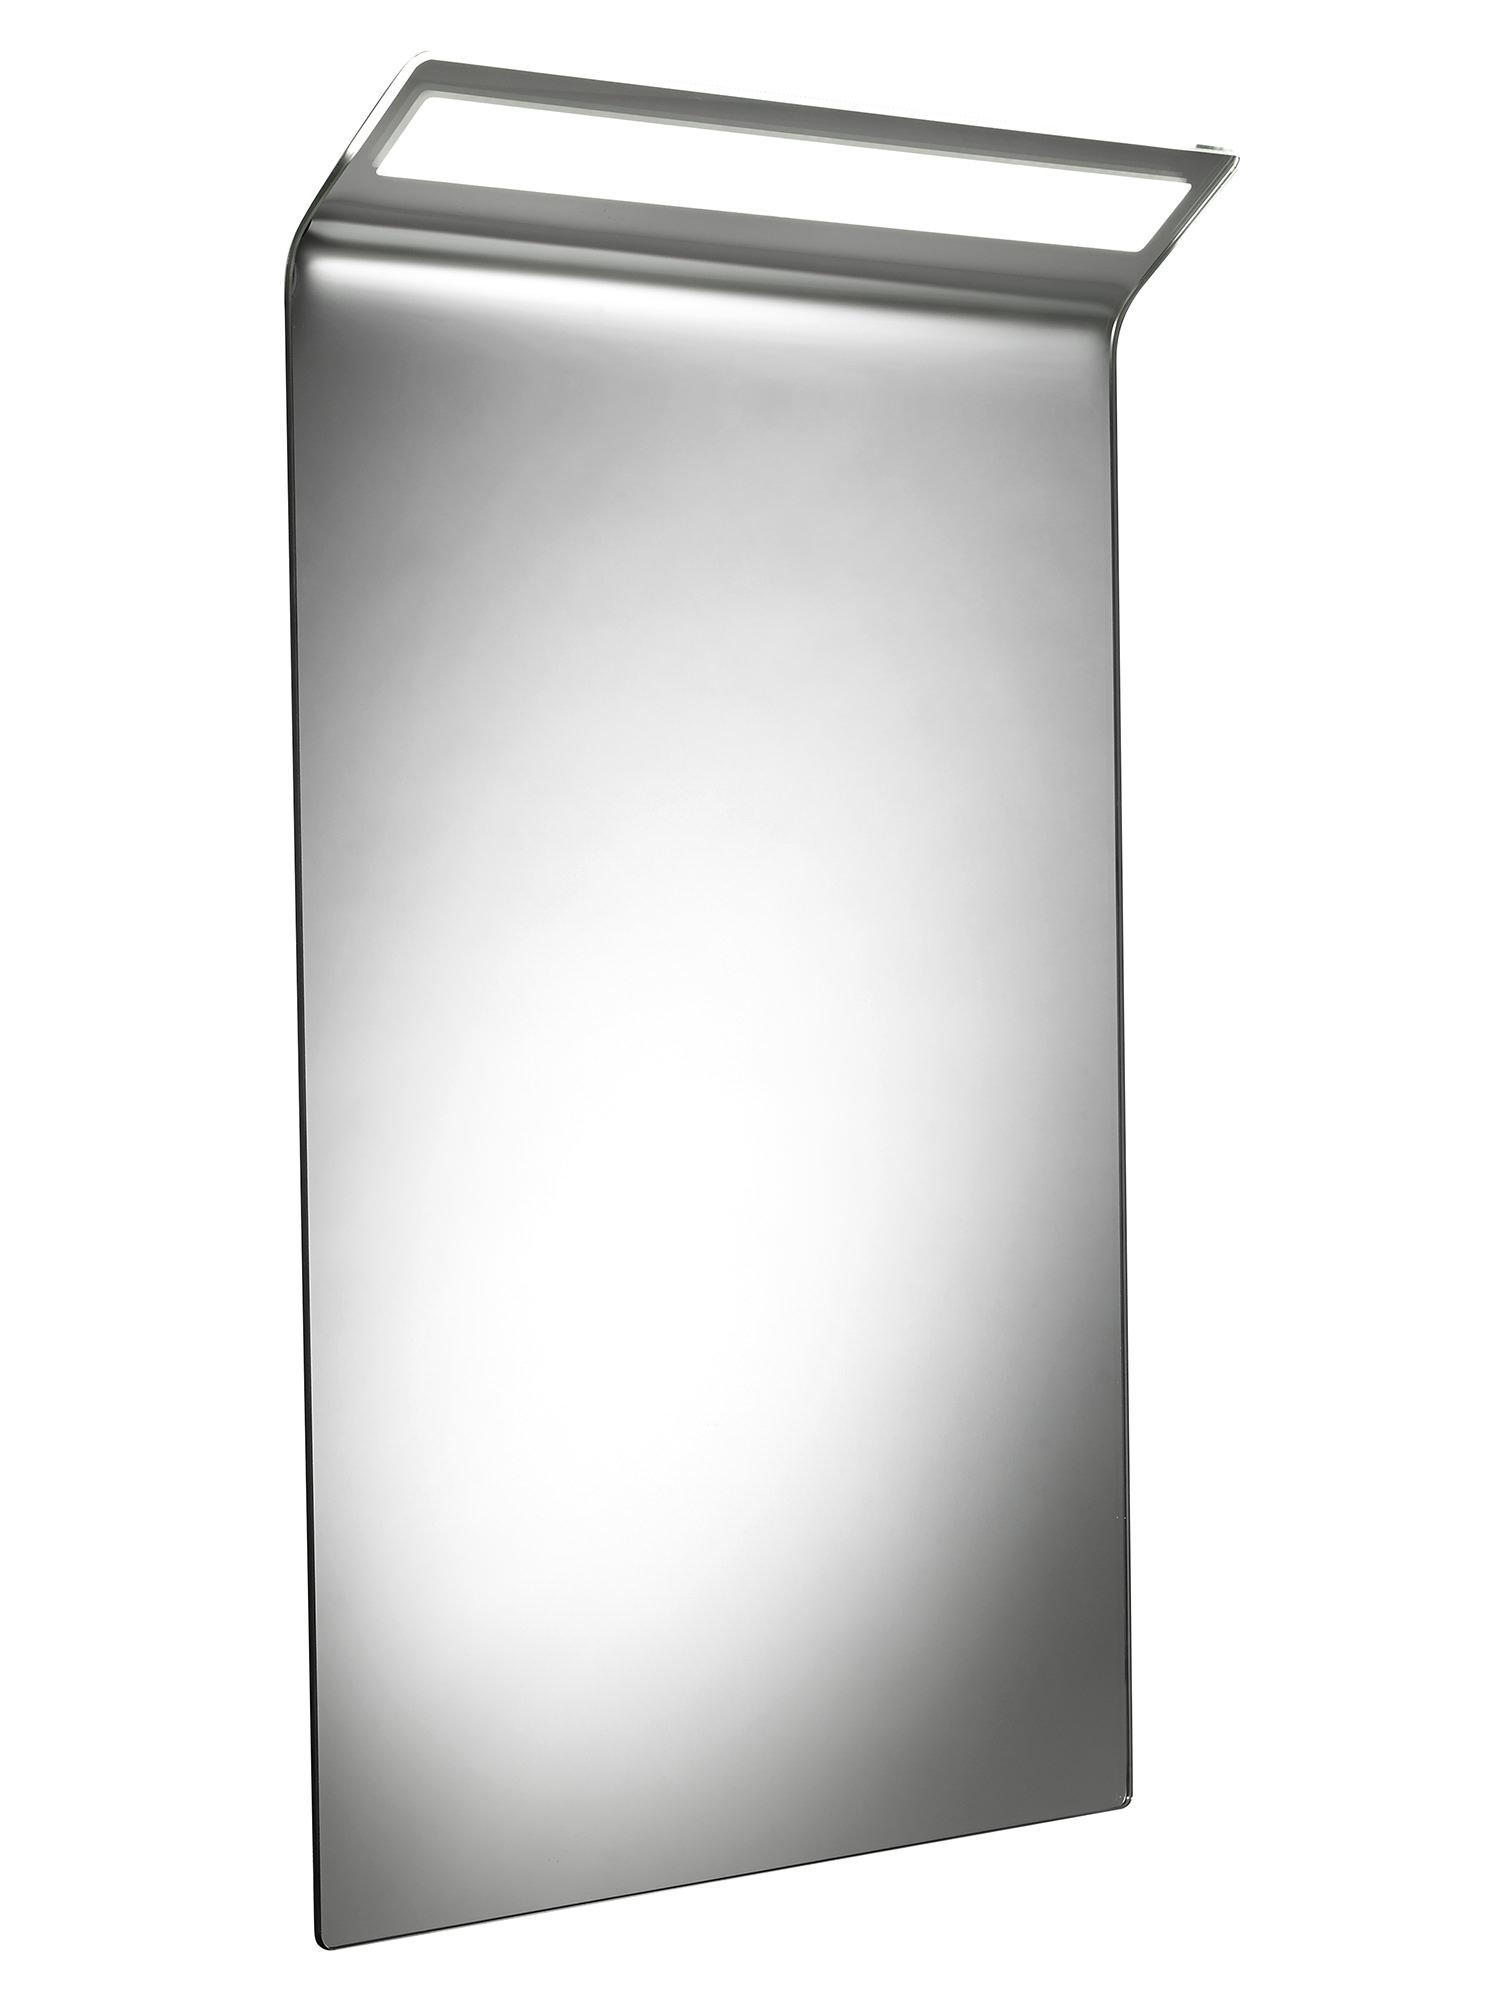 Roper rhodes renew illuminated mirror mle490 for Illuminated mirrors